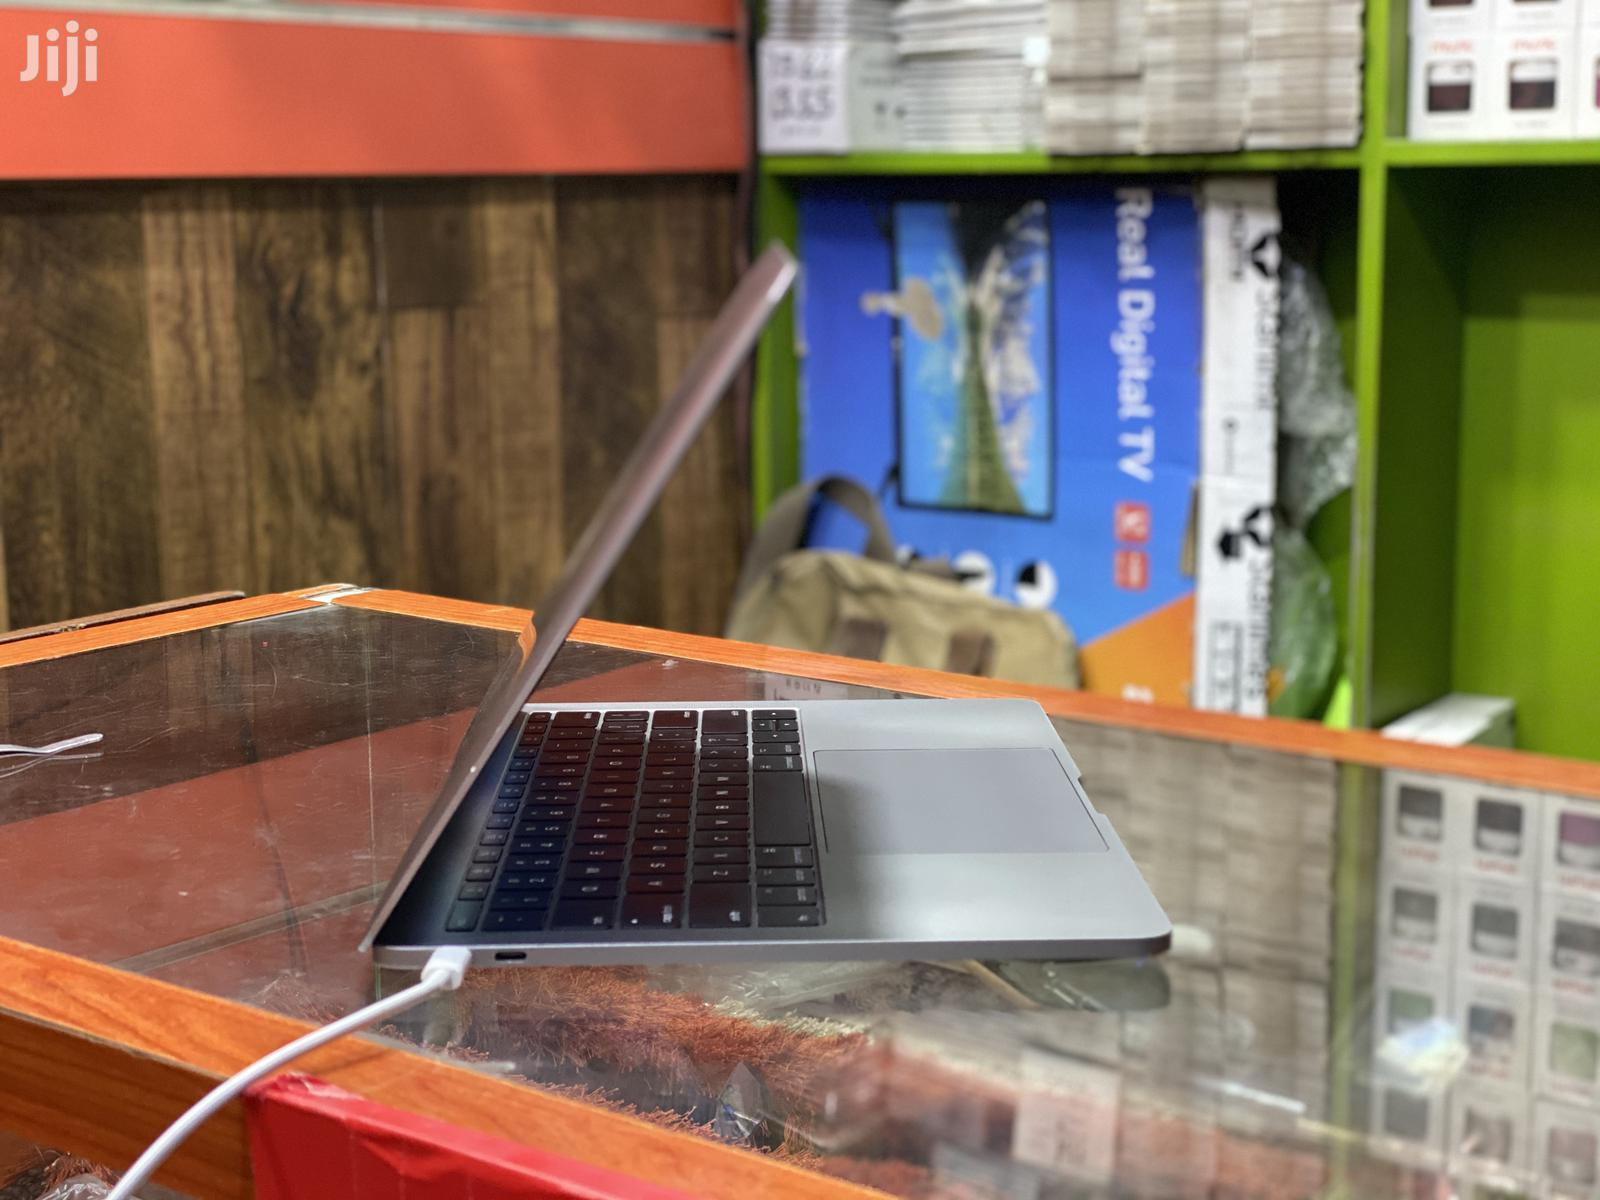 Laptop Apple MacBook 2017 8GB Intel Core I5 SSD 128GB | Laptops & Computers for sale in Ilala, Dar es Salaam, Tanzania